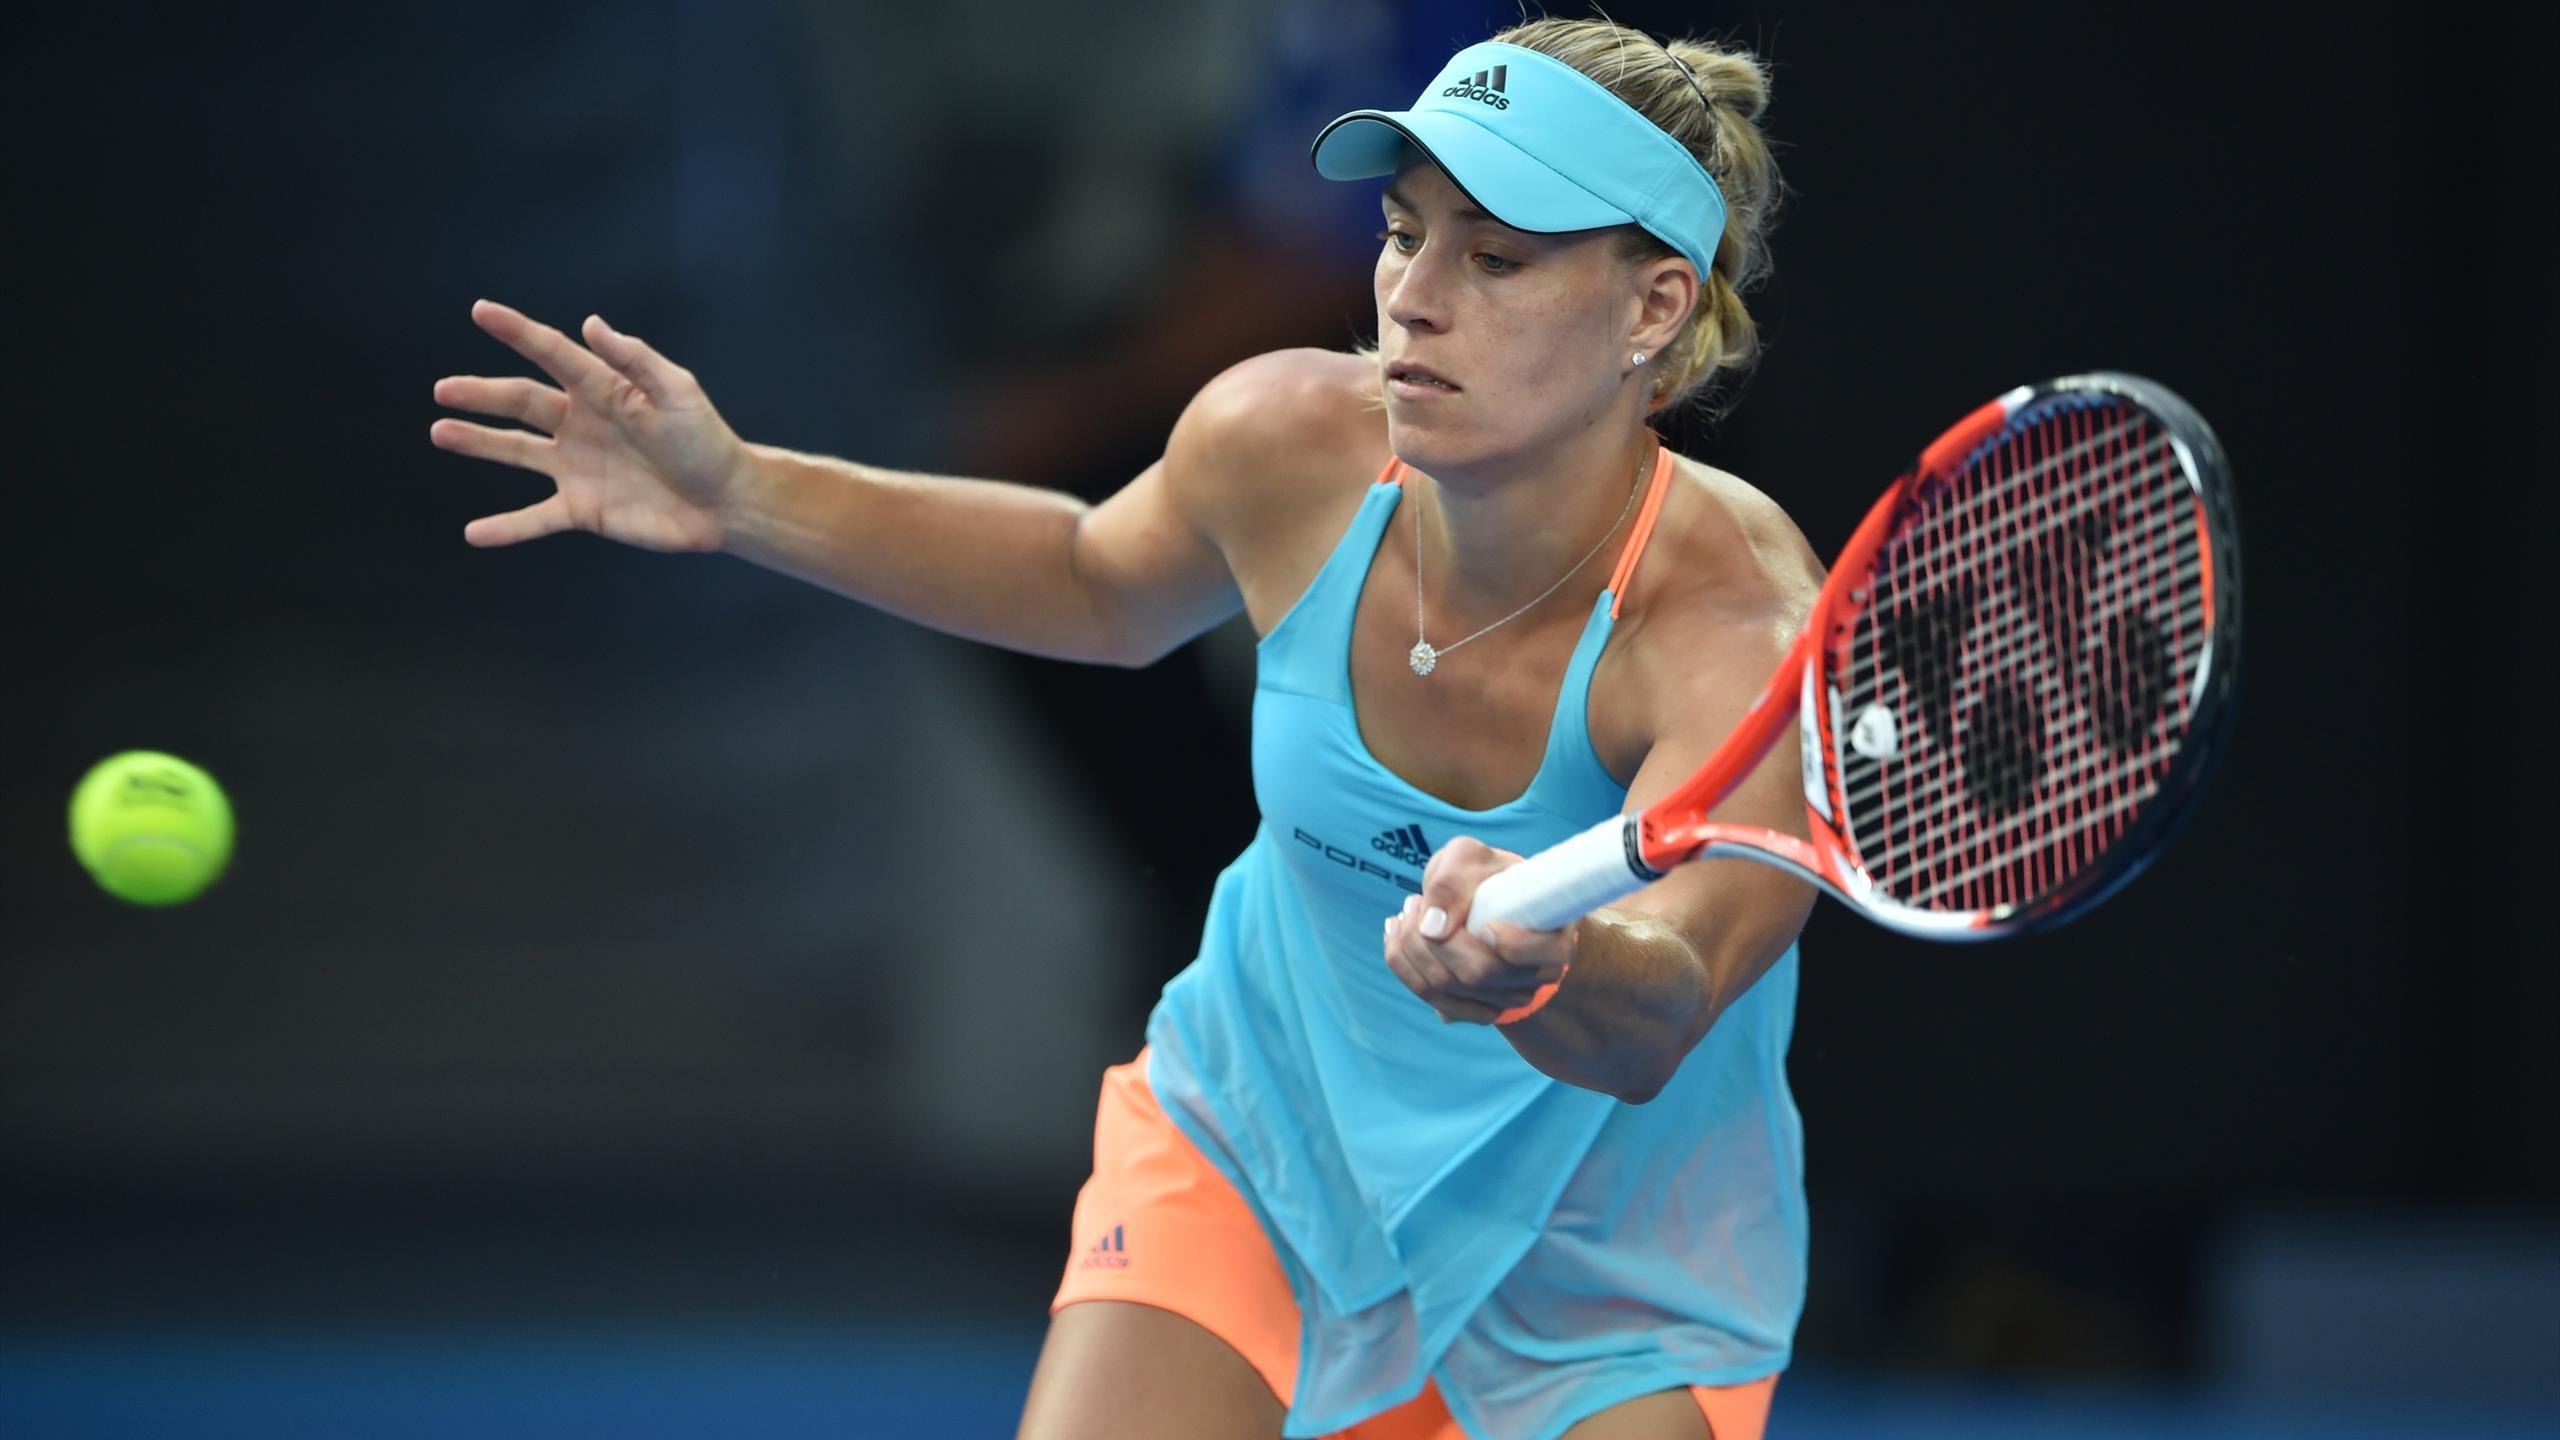 Germany's Angelique Kerber hits a return against Ukraine's Lesia Tsurenko